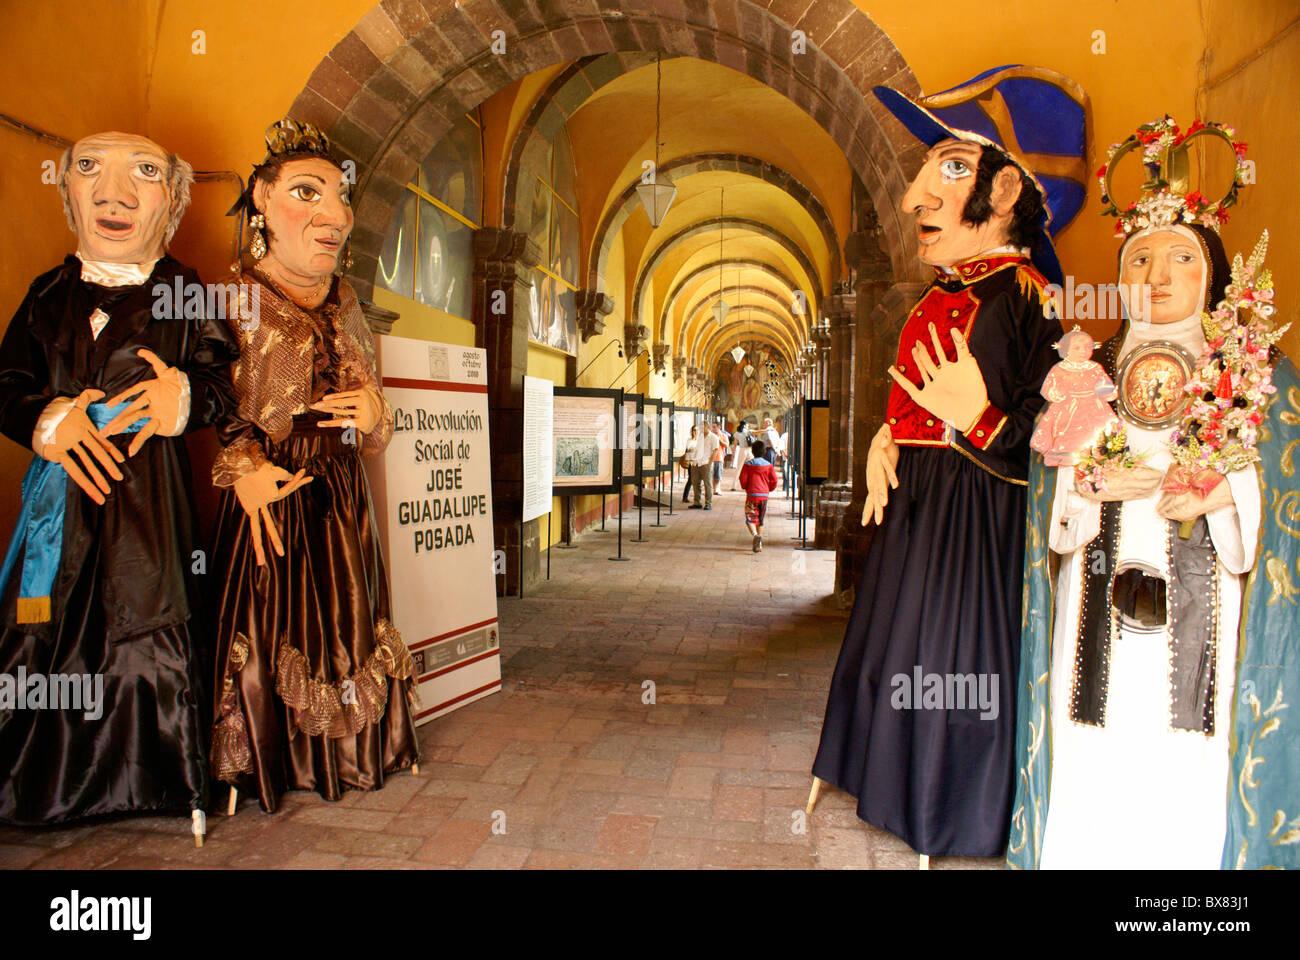 Mojigangas, riesige Pappmaché Marionetten in der Bellas Artes, San Miguel de Allende, Mexiko. Stockbild